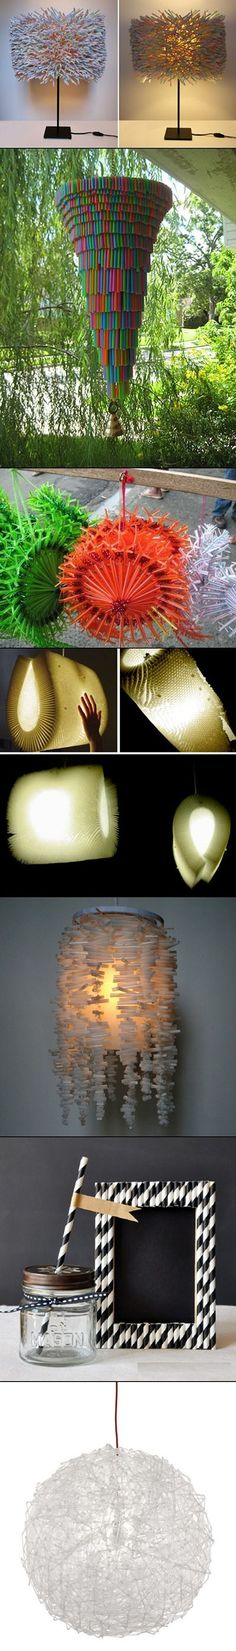 4  decoration with plastic strawsbb737c15b | DIY